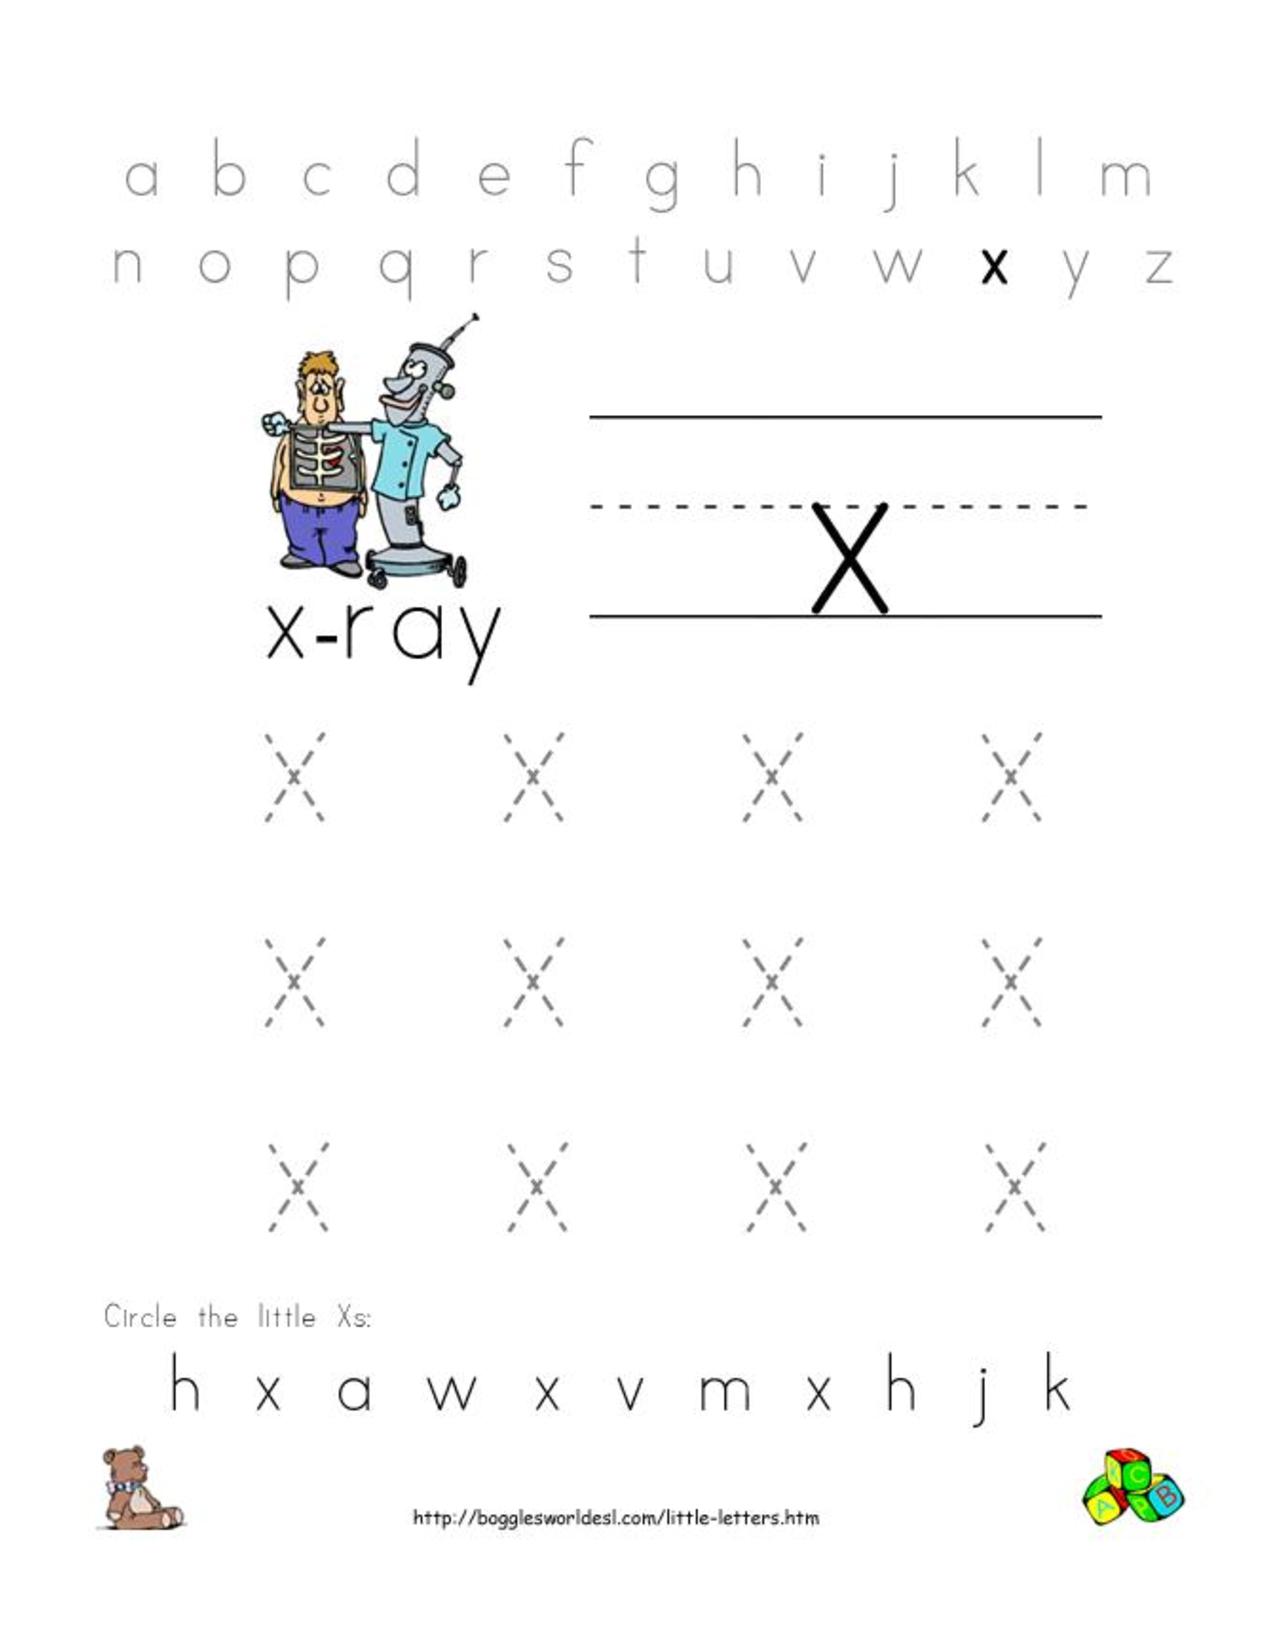 Alphabet Worksheets For Preschoolers | Alphabet Worksheet inside Letter X Worksheets For Prek